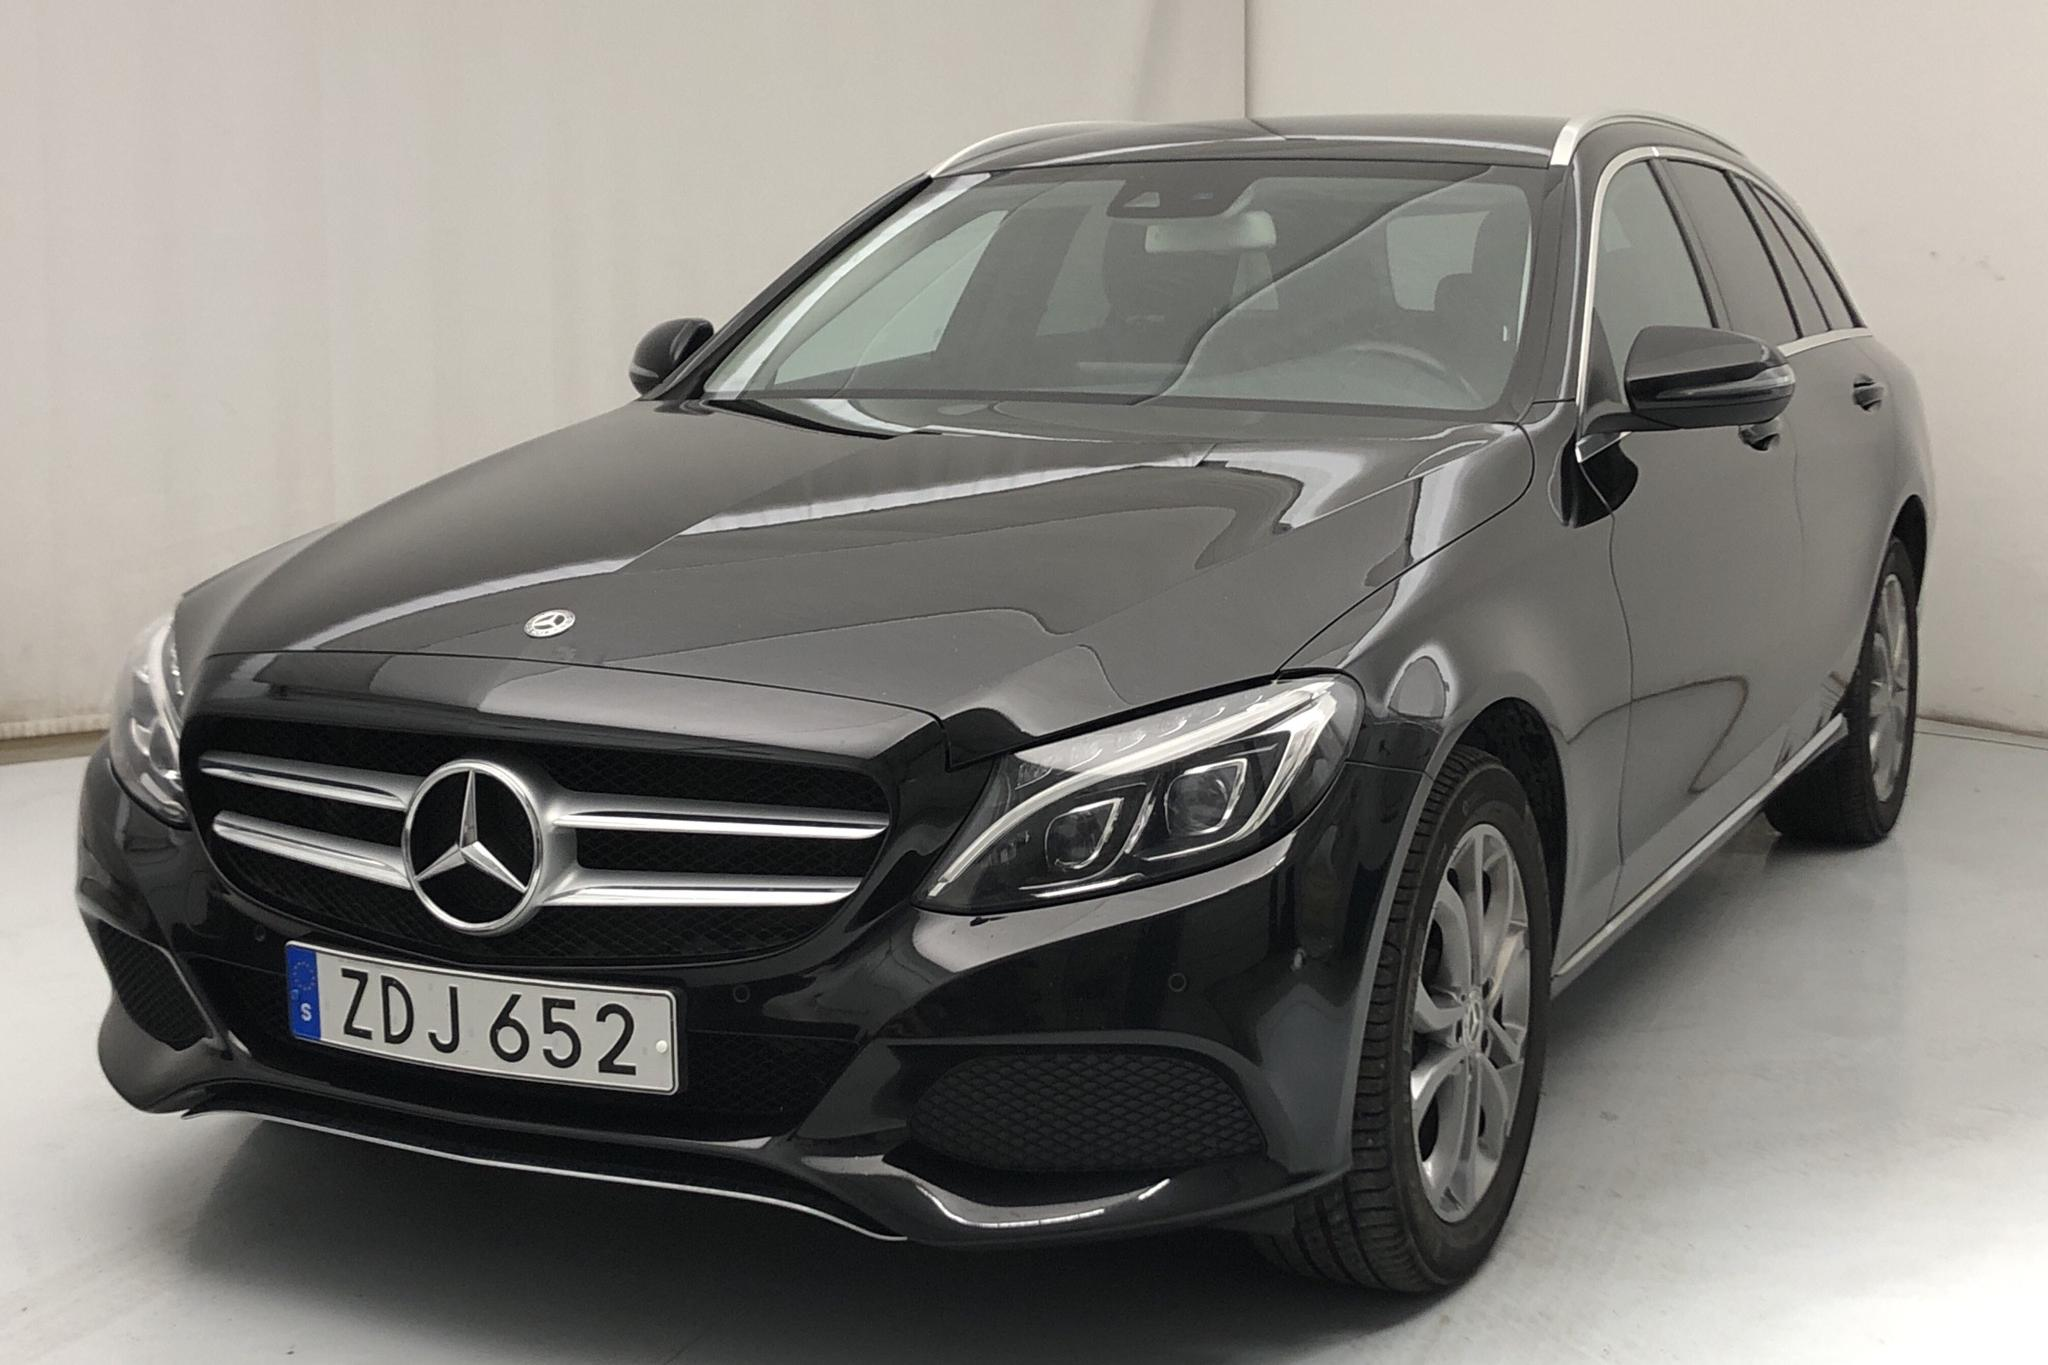 Mercedes C 200 4MATIC Kombi S205 (184hk)